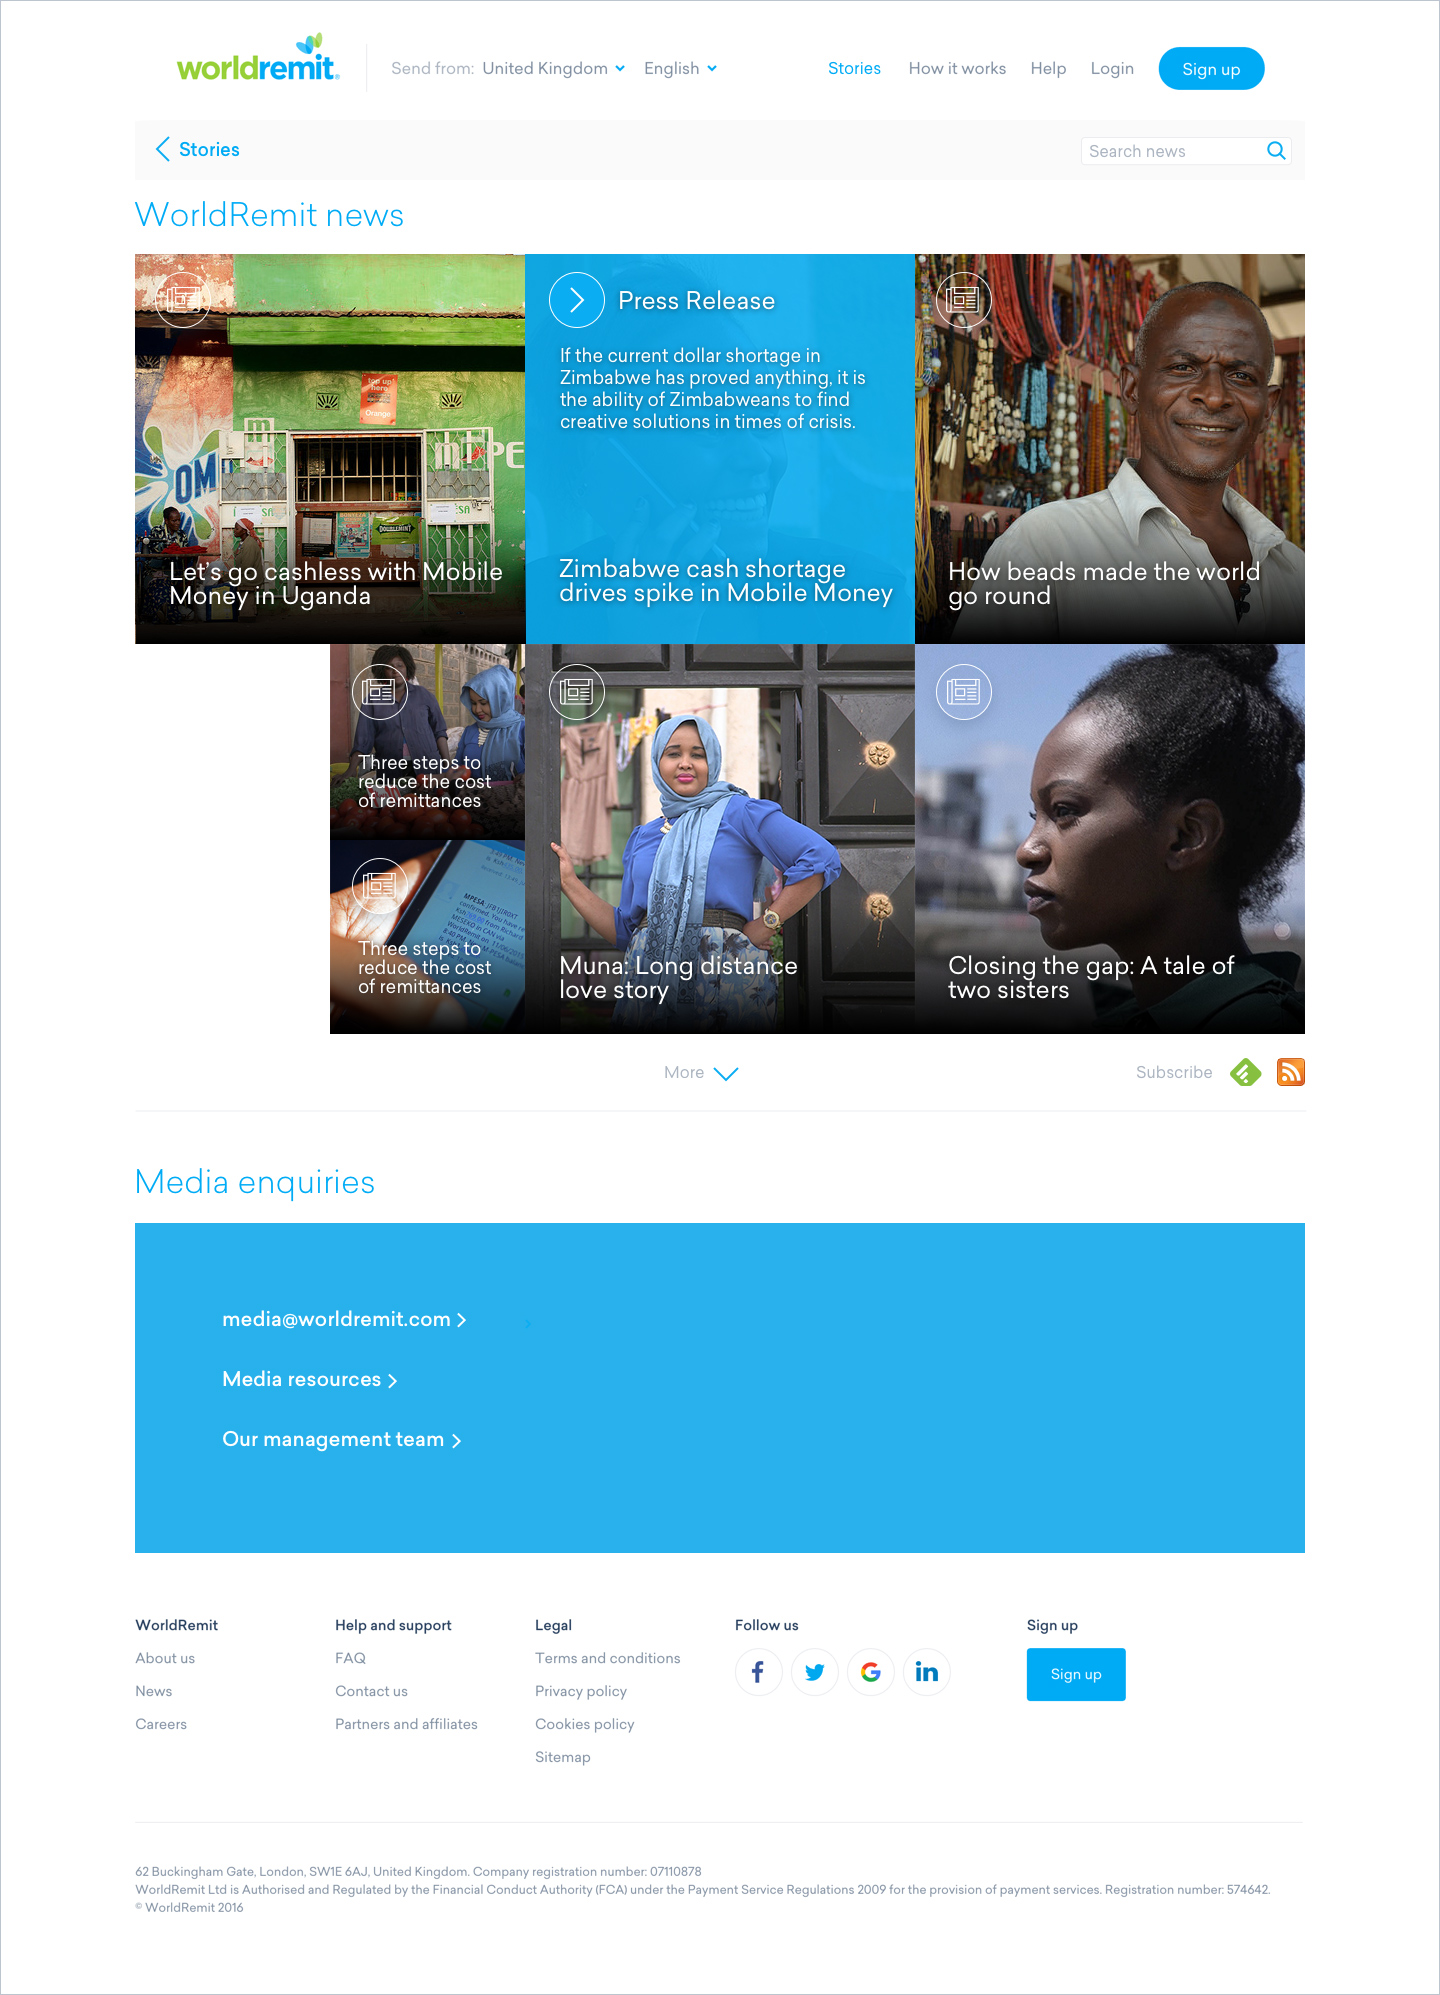 WorldRemit Stories Newsroom page